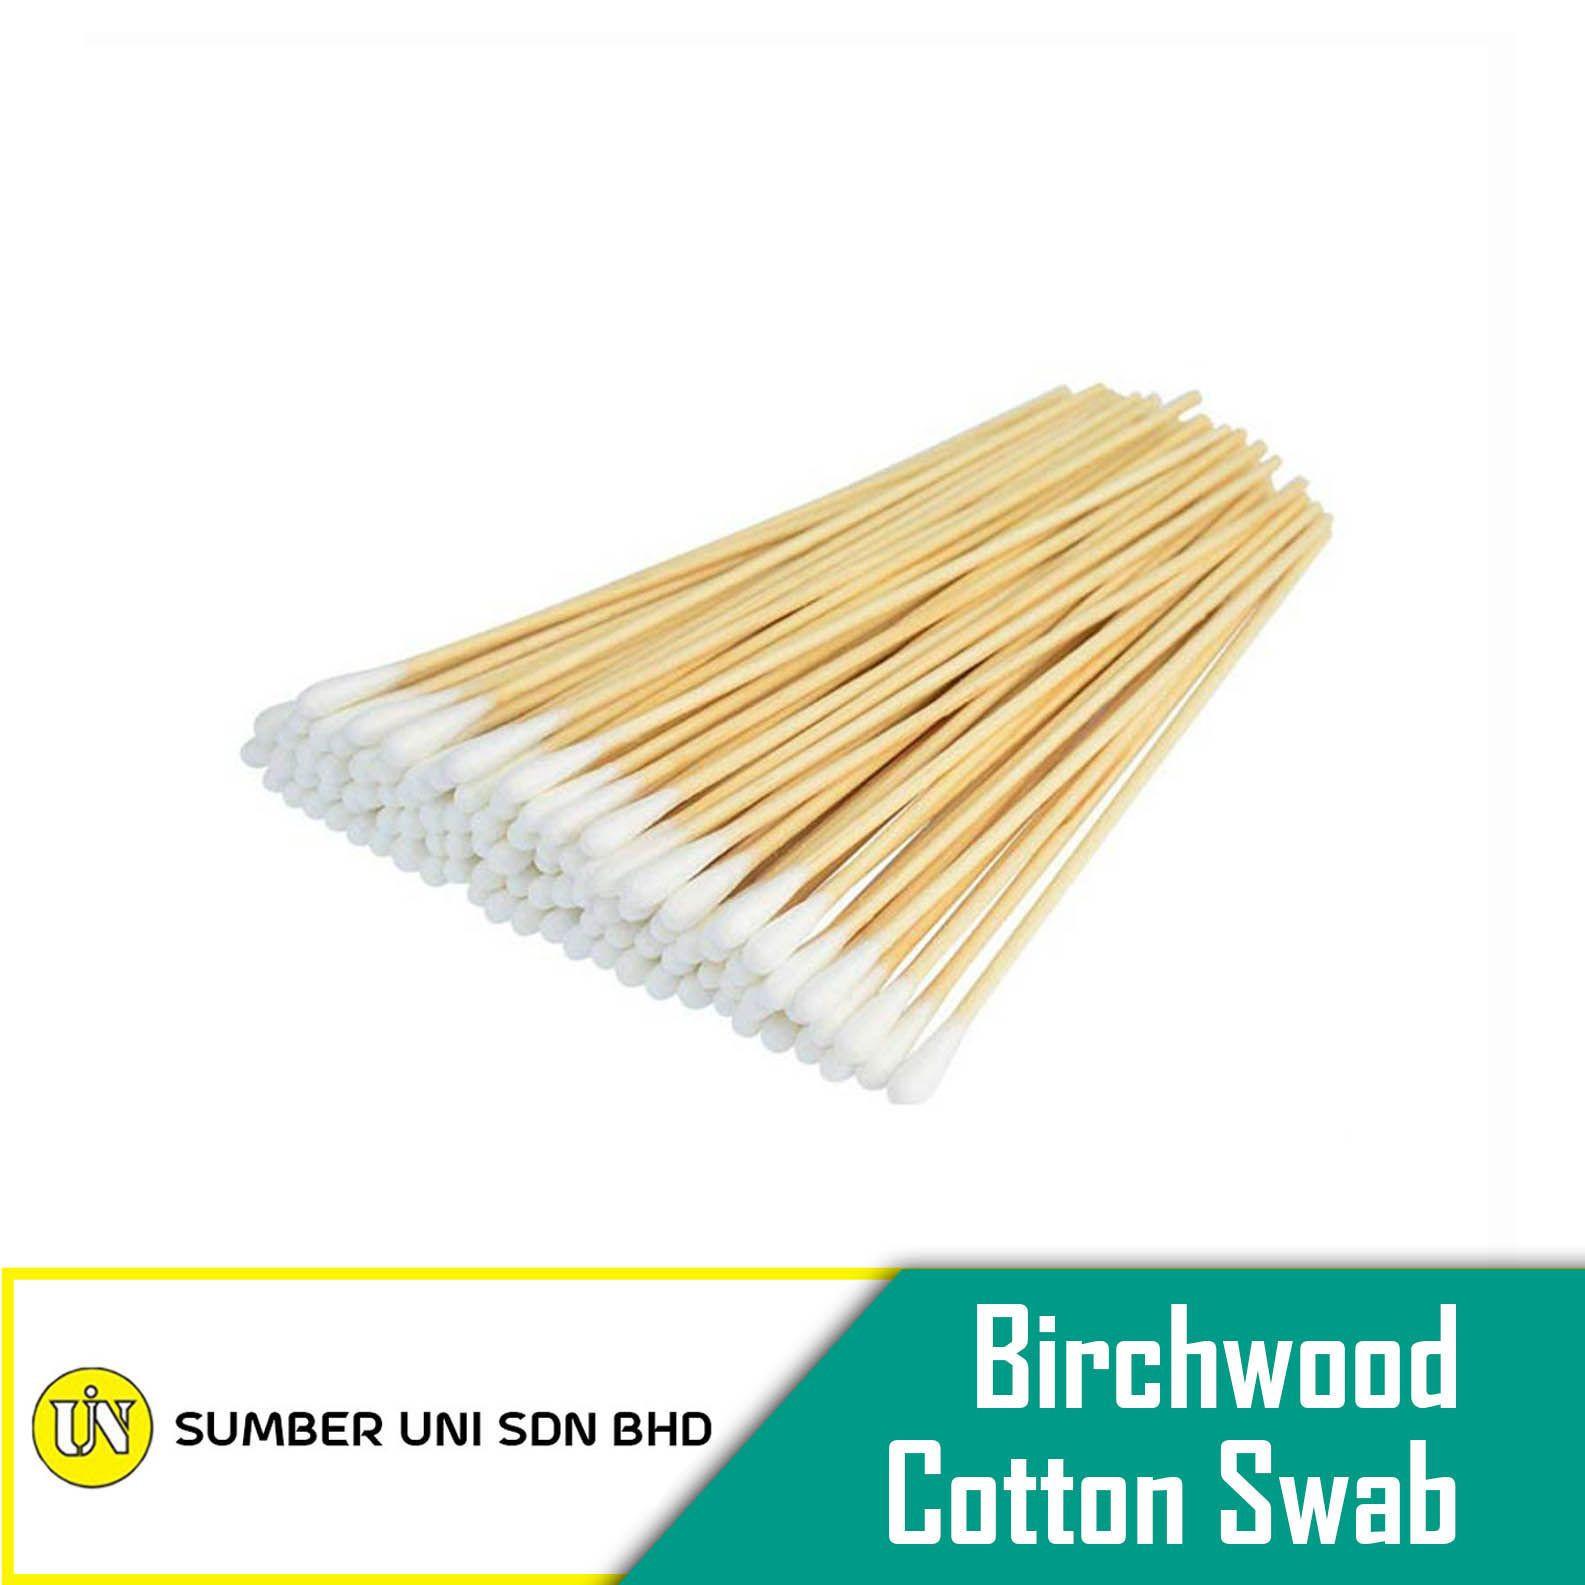 Birchwood Cotton Swab